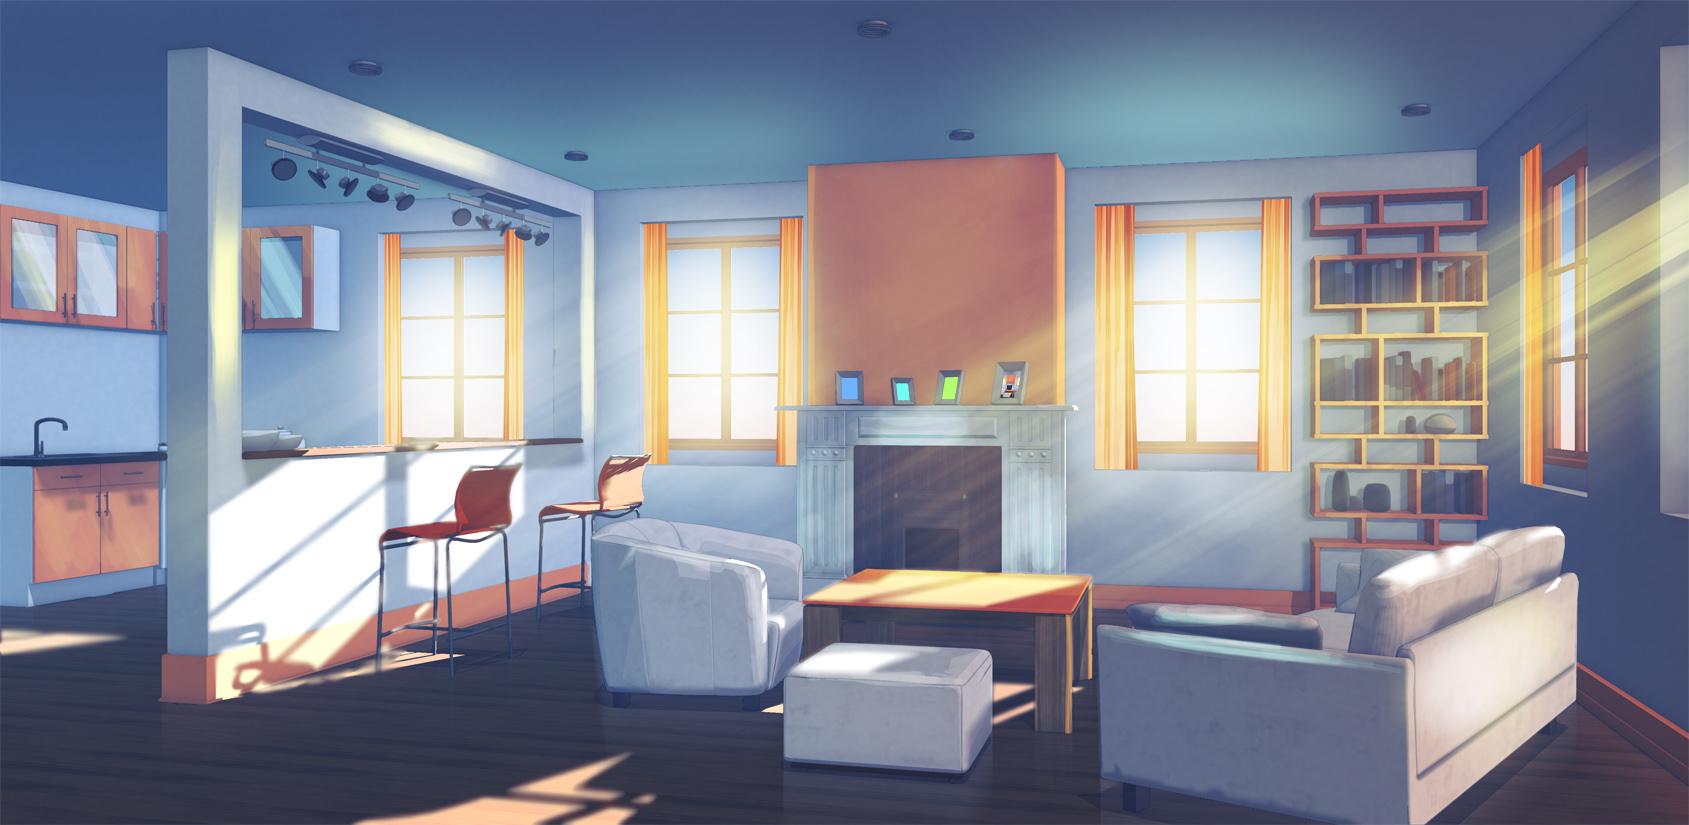 Backgrounds Aurora S Nightmare Dev Blog